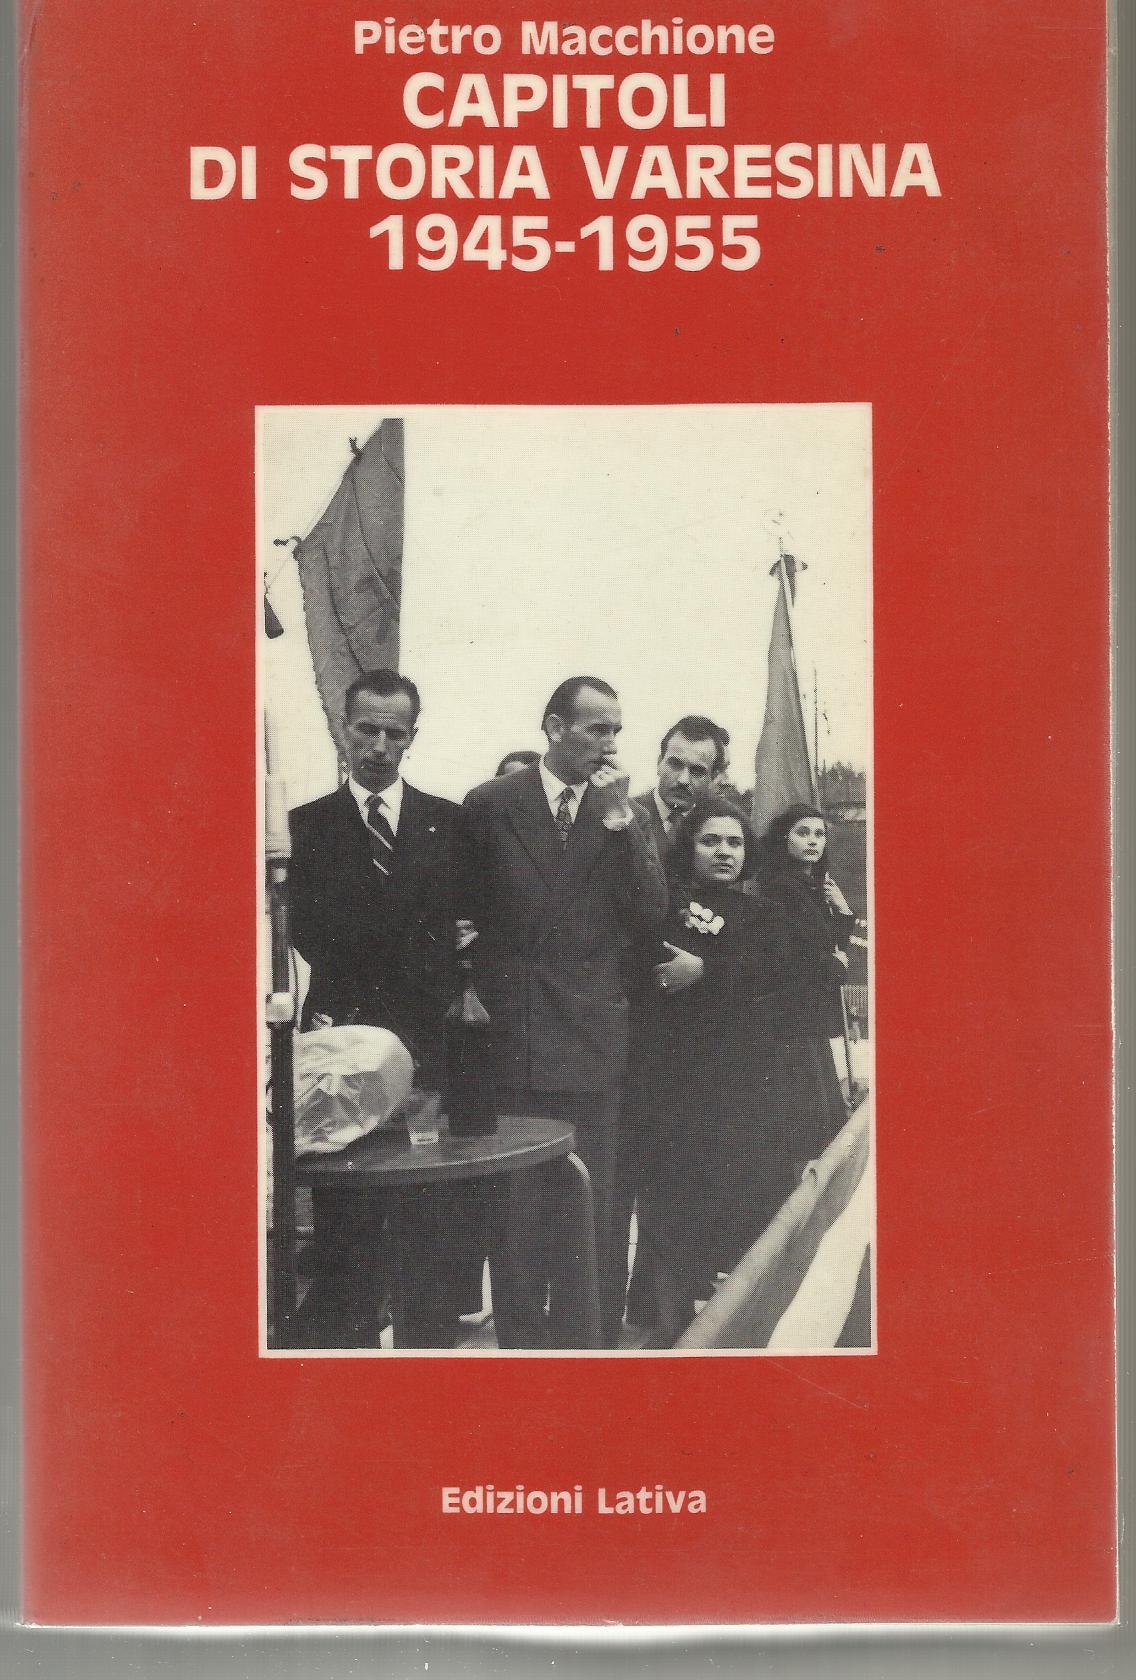 Capitoli di storia varesina, 1945-1955